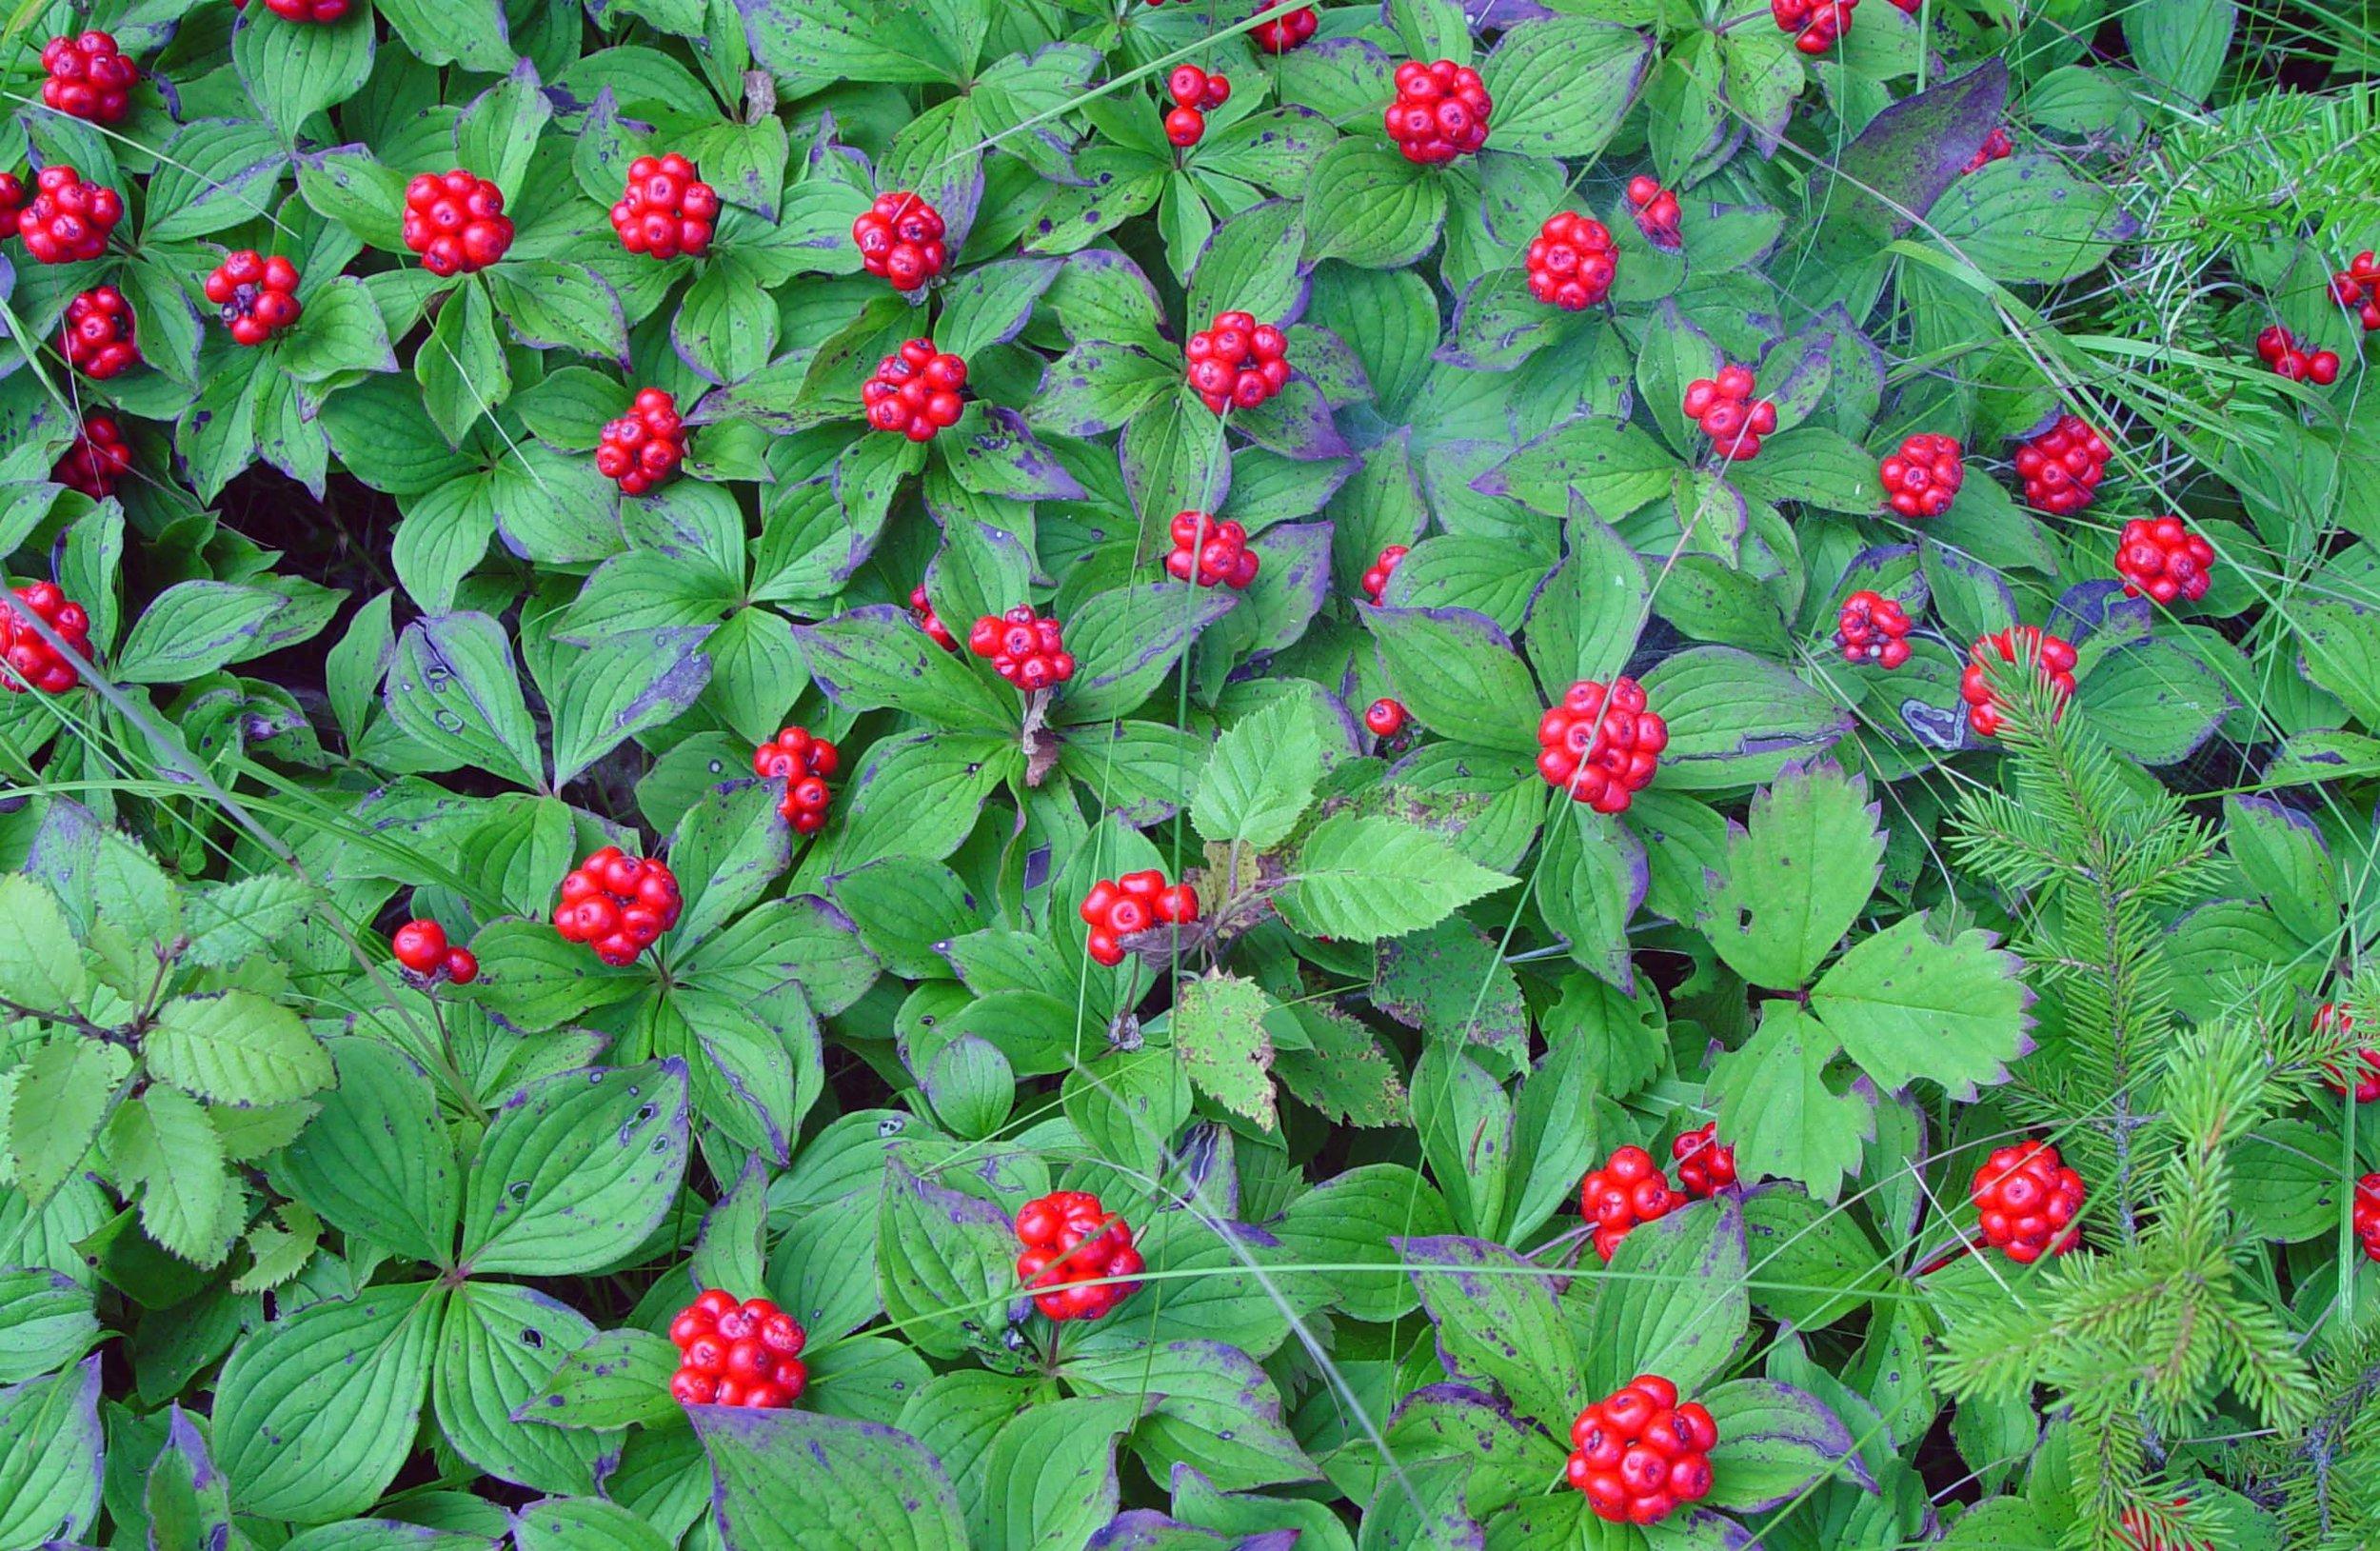 Chamaepericlymenum canadense fruiting plants.jpg